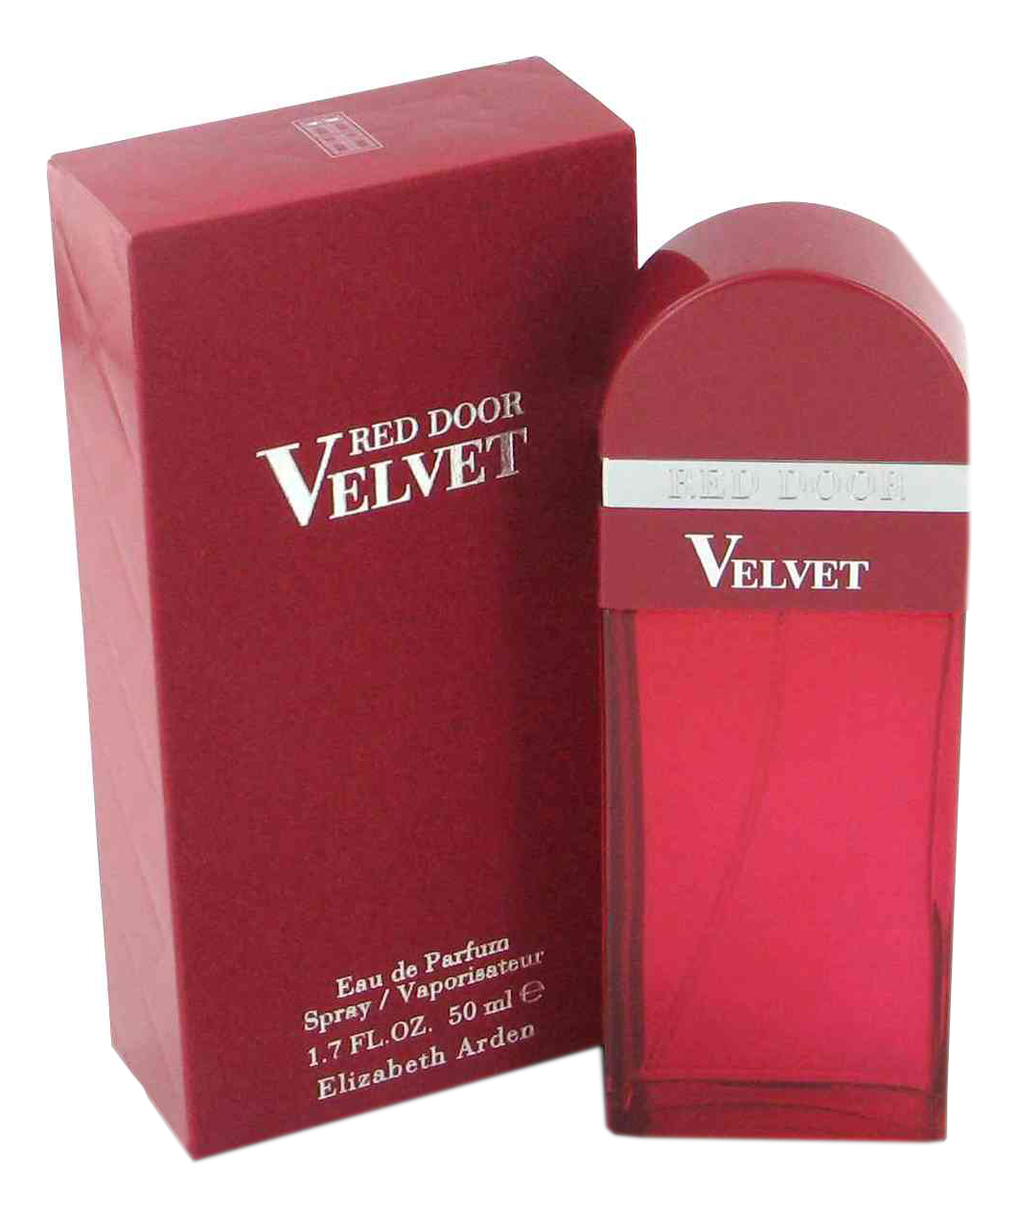 Elizabeth Arden Red Door Velvet: парфюмерная вода 50мл пила бензиновая цепная mcculloch cs 35 шина 35 см